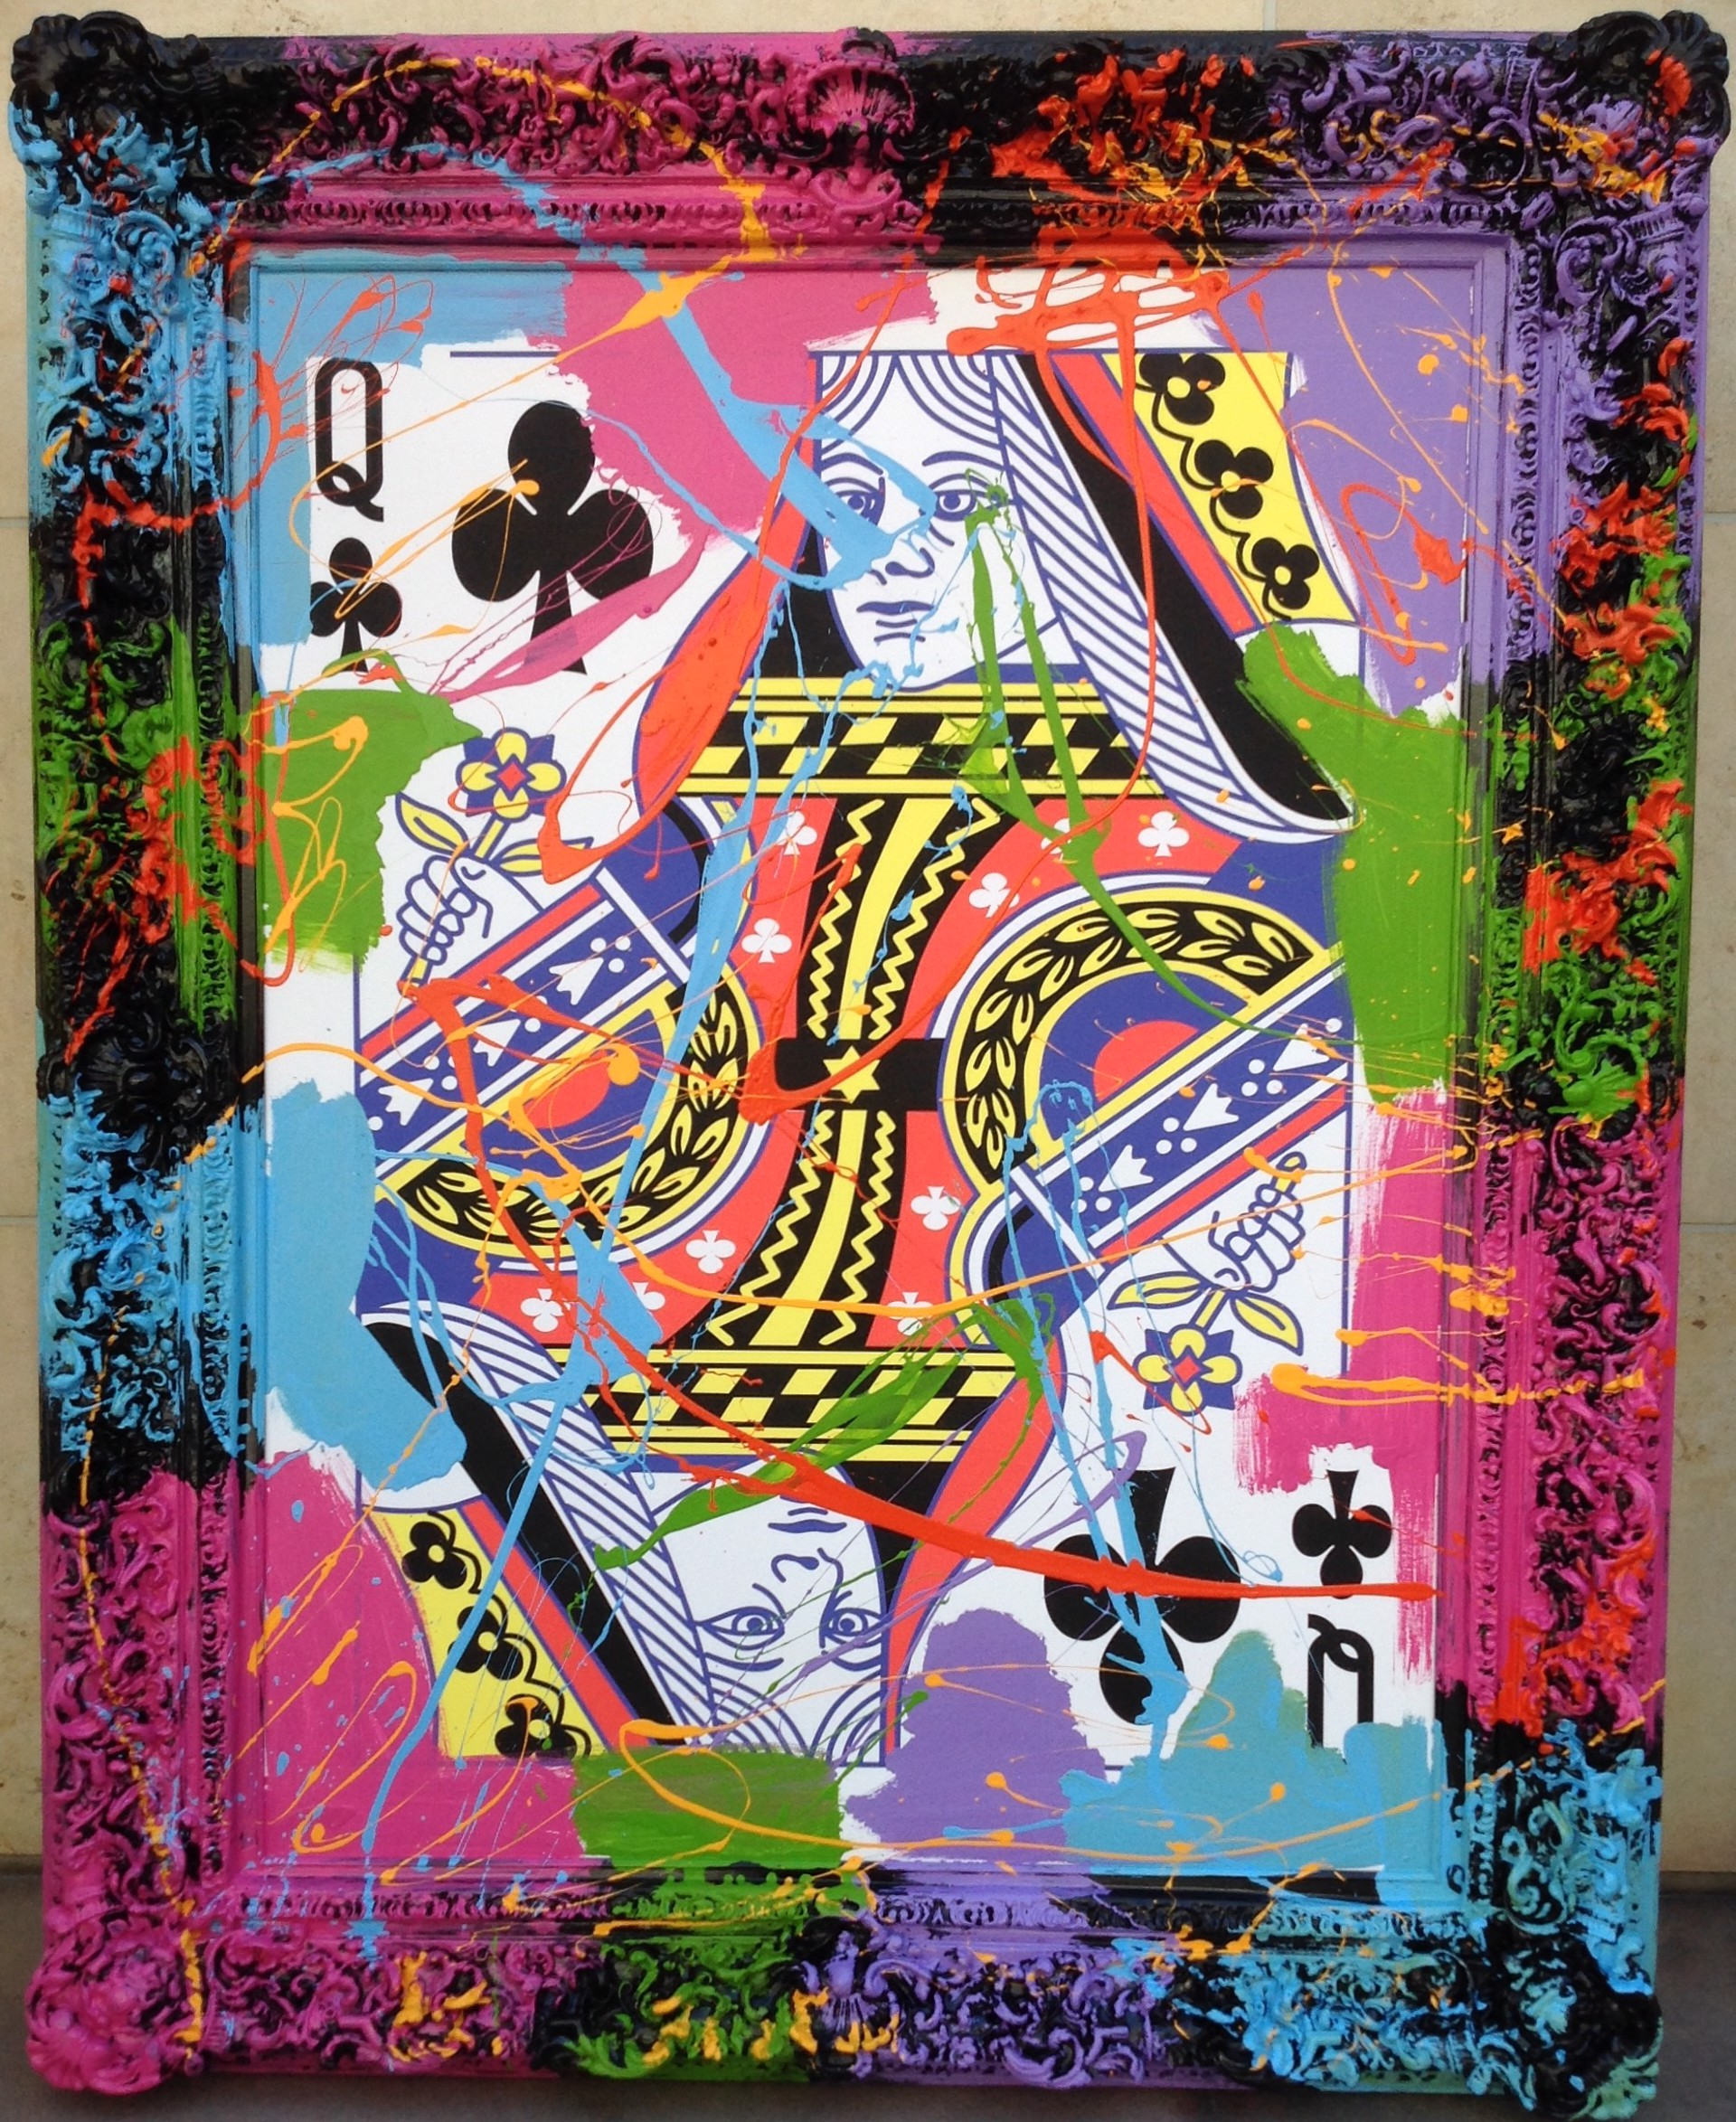 Queen of Clubs by Elena Bulatova